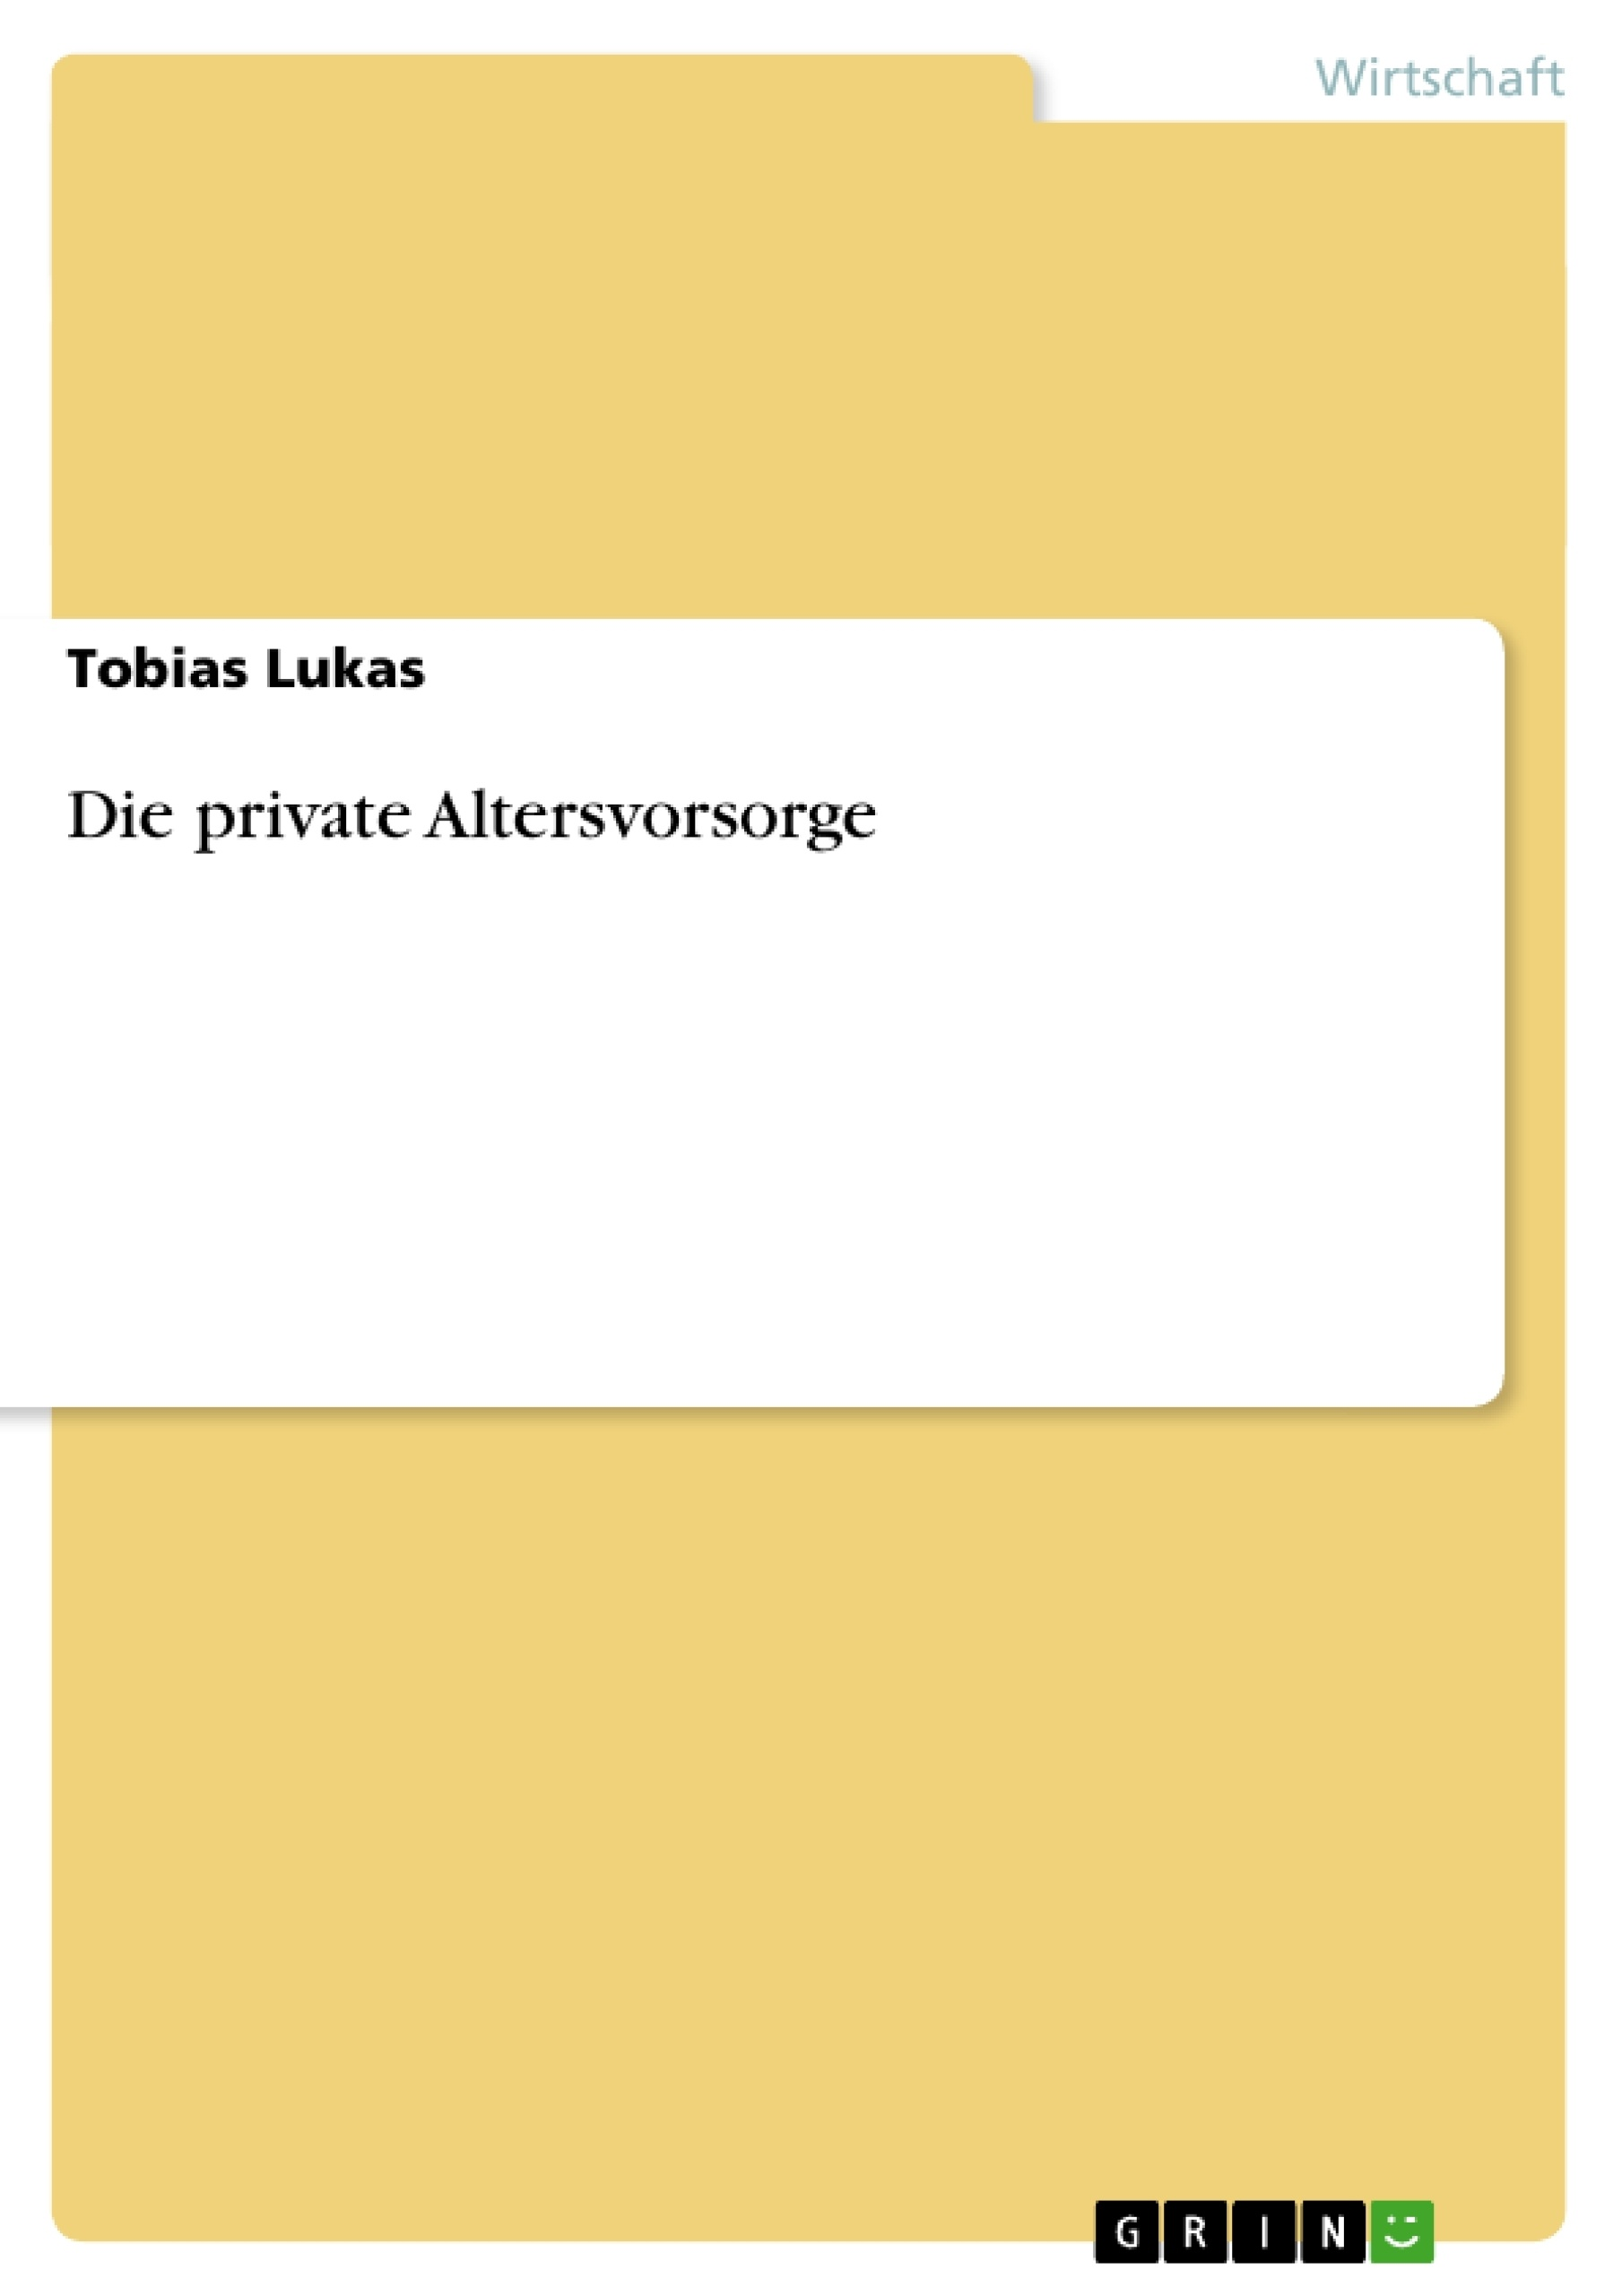 Titel: Die private Altersvorsorge